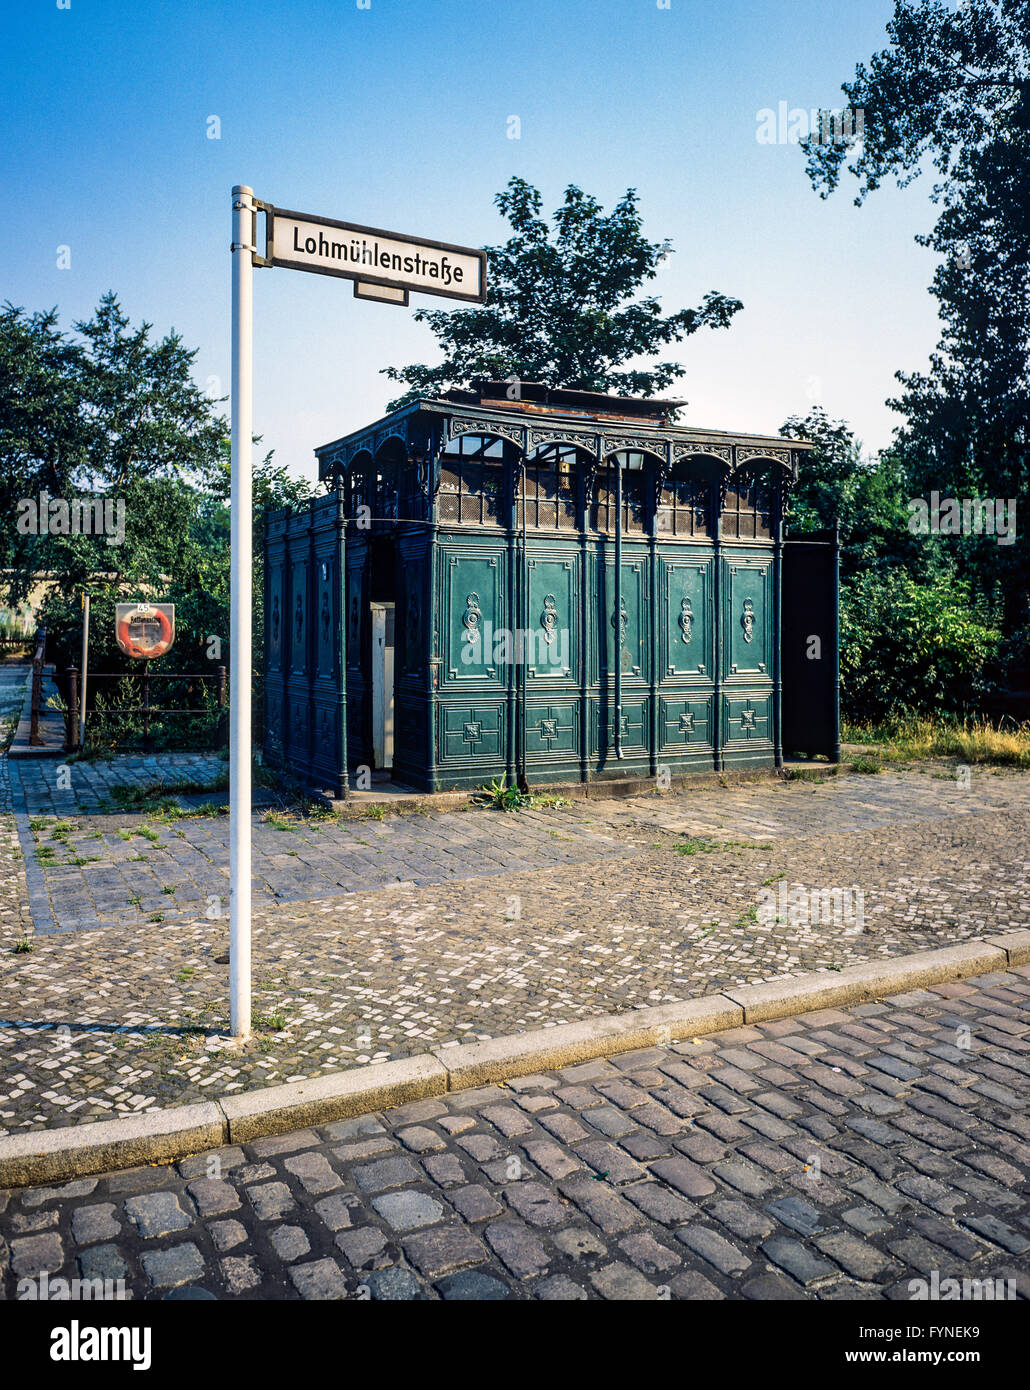 August 1986, ancient public toilet 1899, Lohmühlenstrasse street sign, Treptow, West Berlin side, Germany, - Stock Image